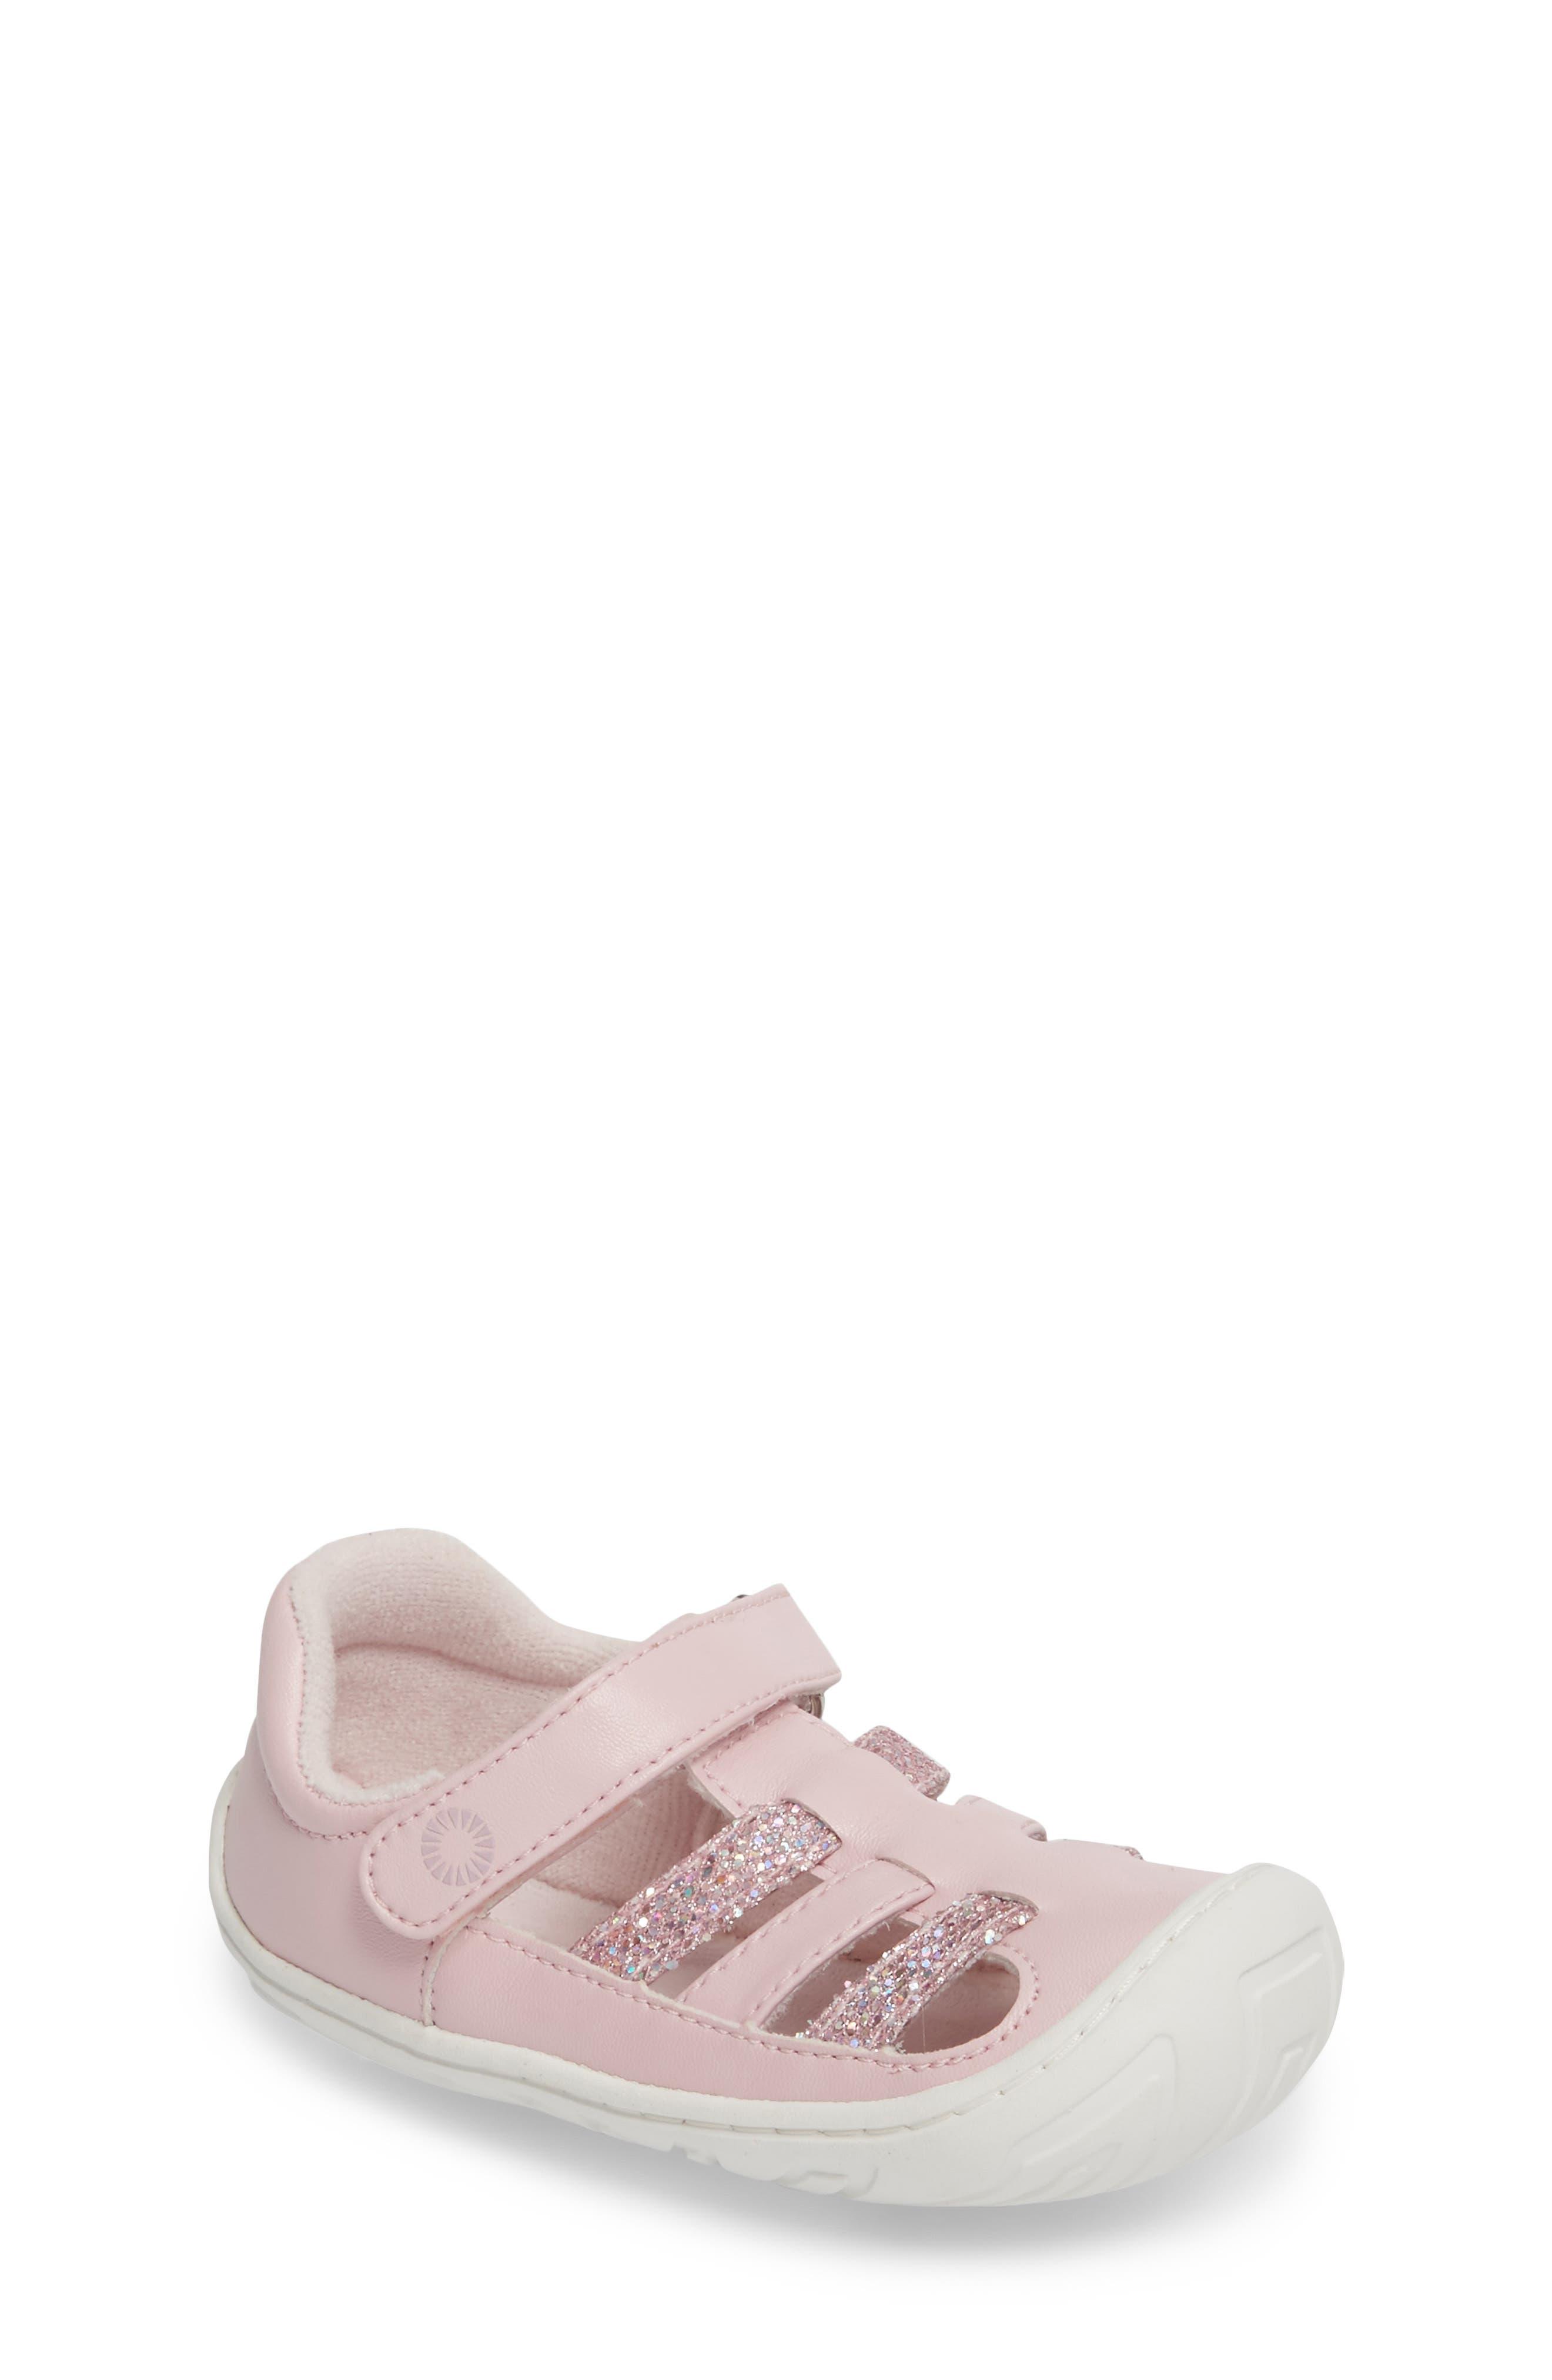 Santore Glitter Sandal,                         Main,                         color, Seashell Pink